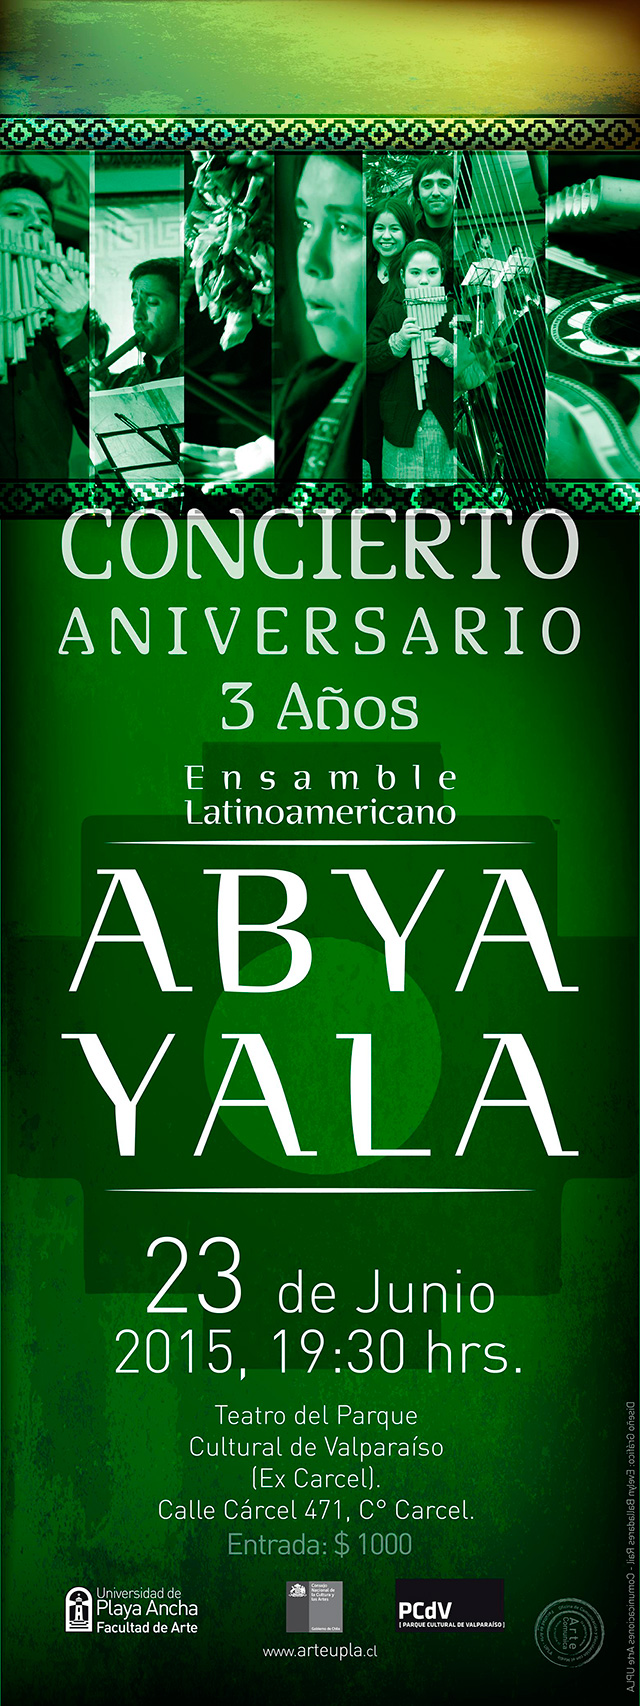 aniversario_abya_yala_arteupla